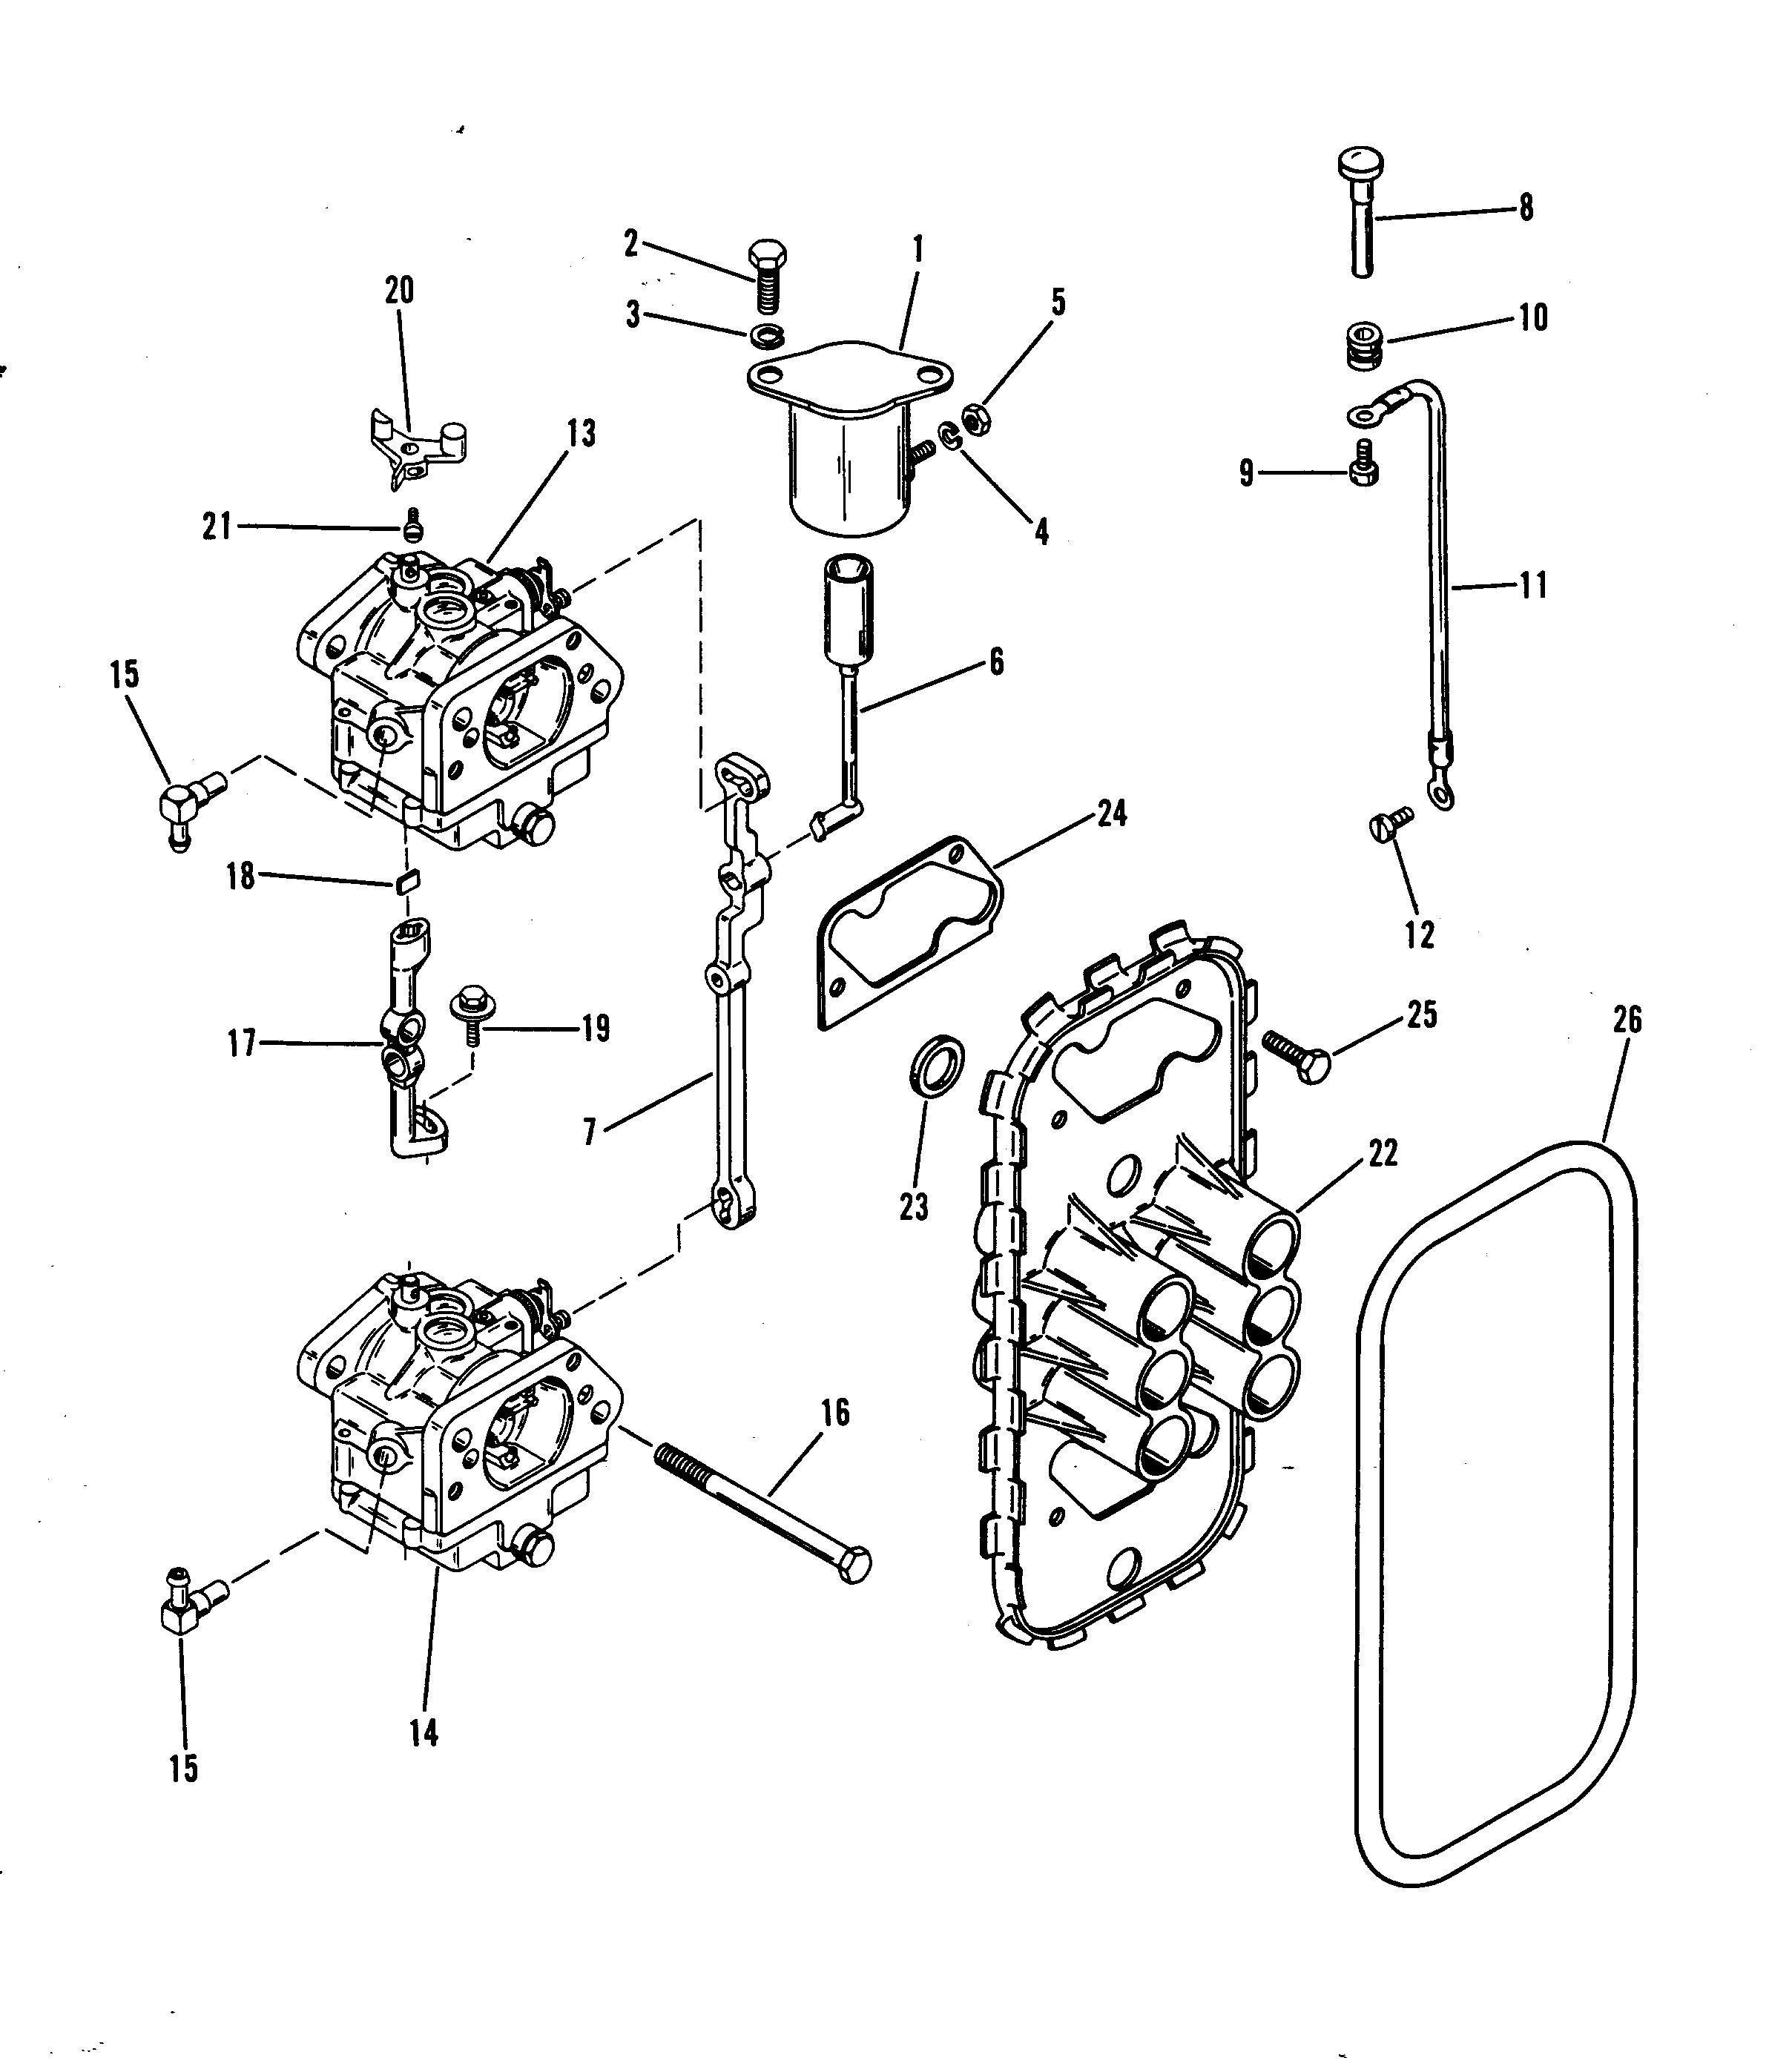 Mercury Mariner 75 4 Cyl And Up Carburetor Linkage